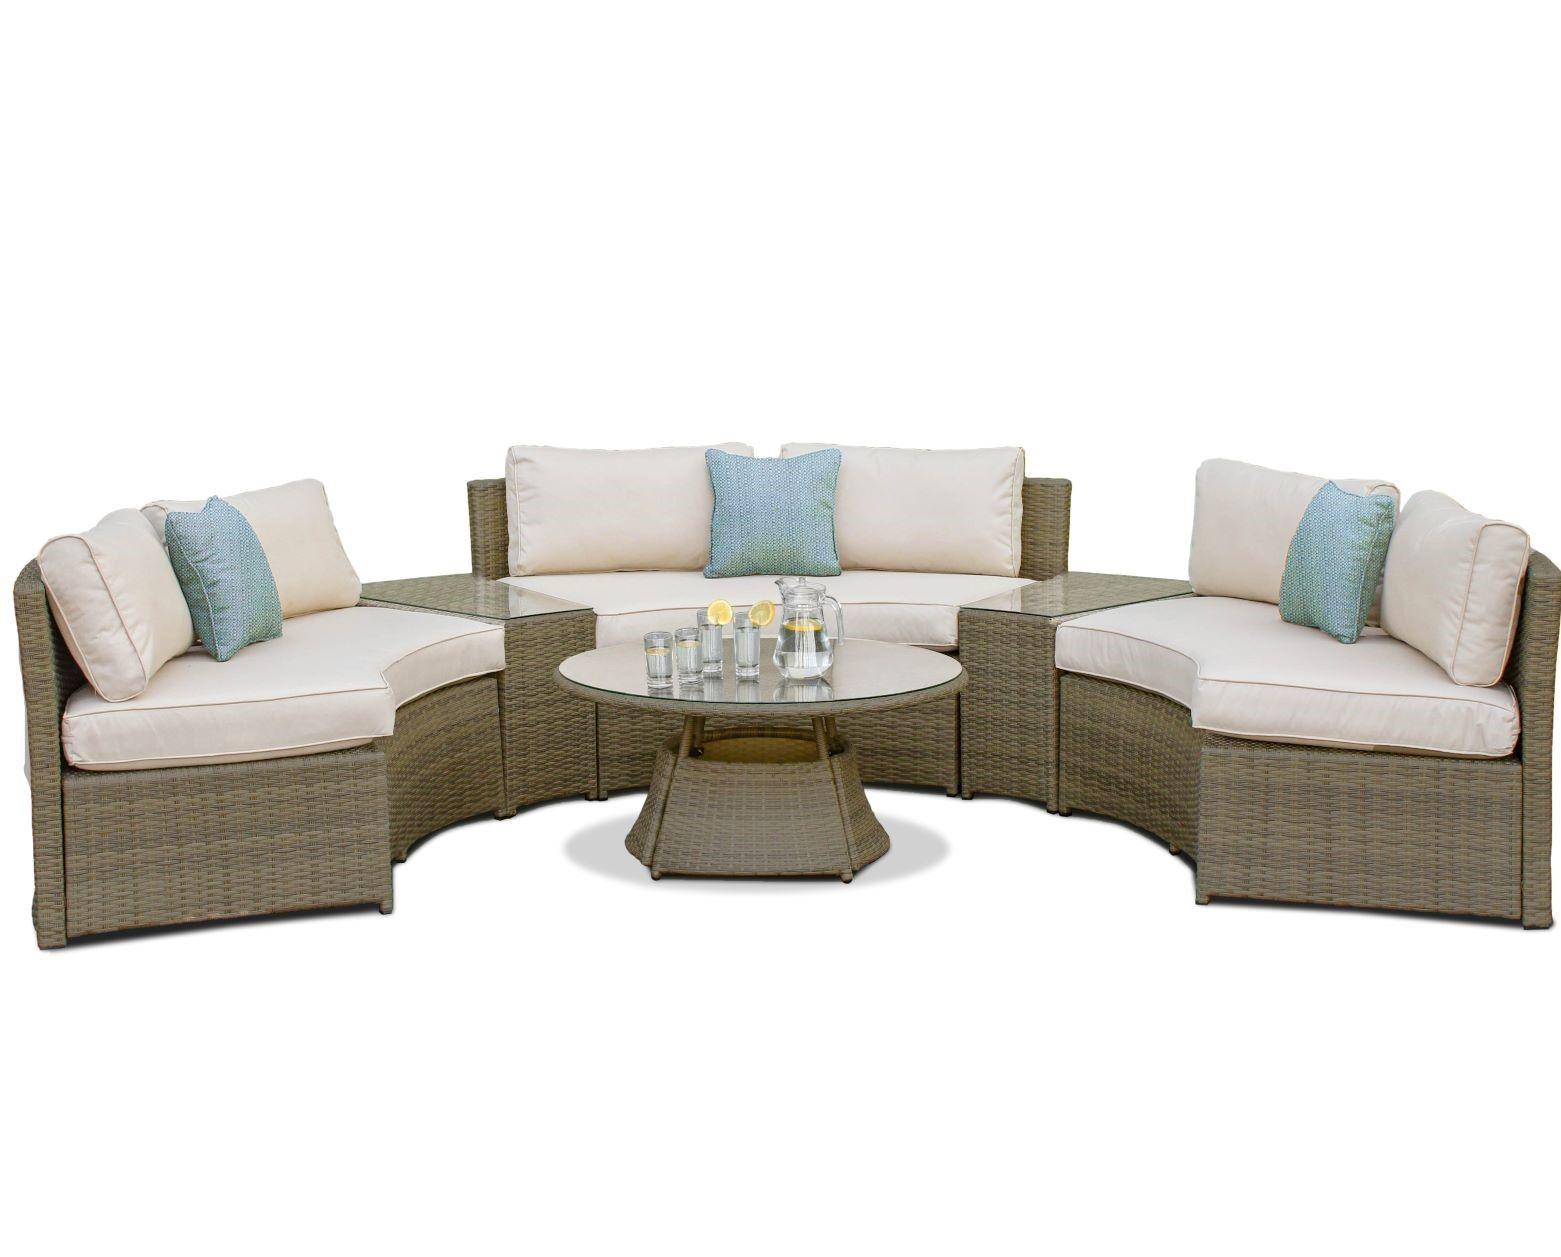 Maze Rattan Garden Furniture Tuscany Half Moon Sofa Set In 2020